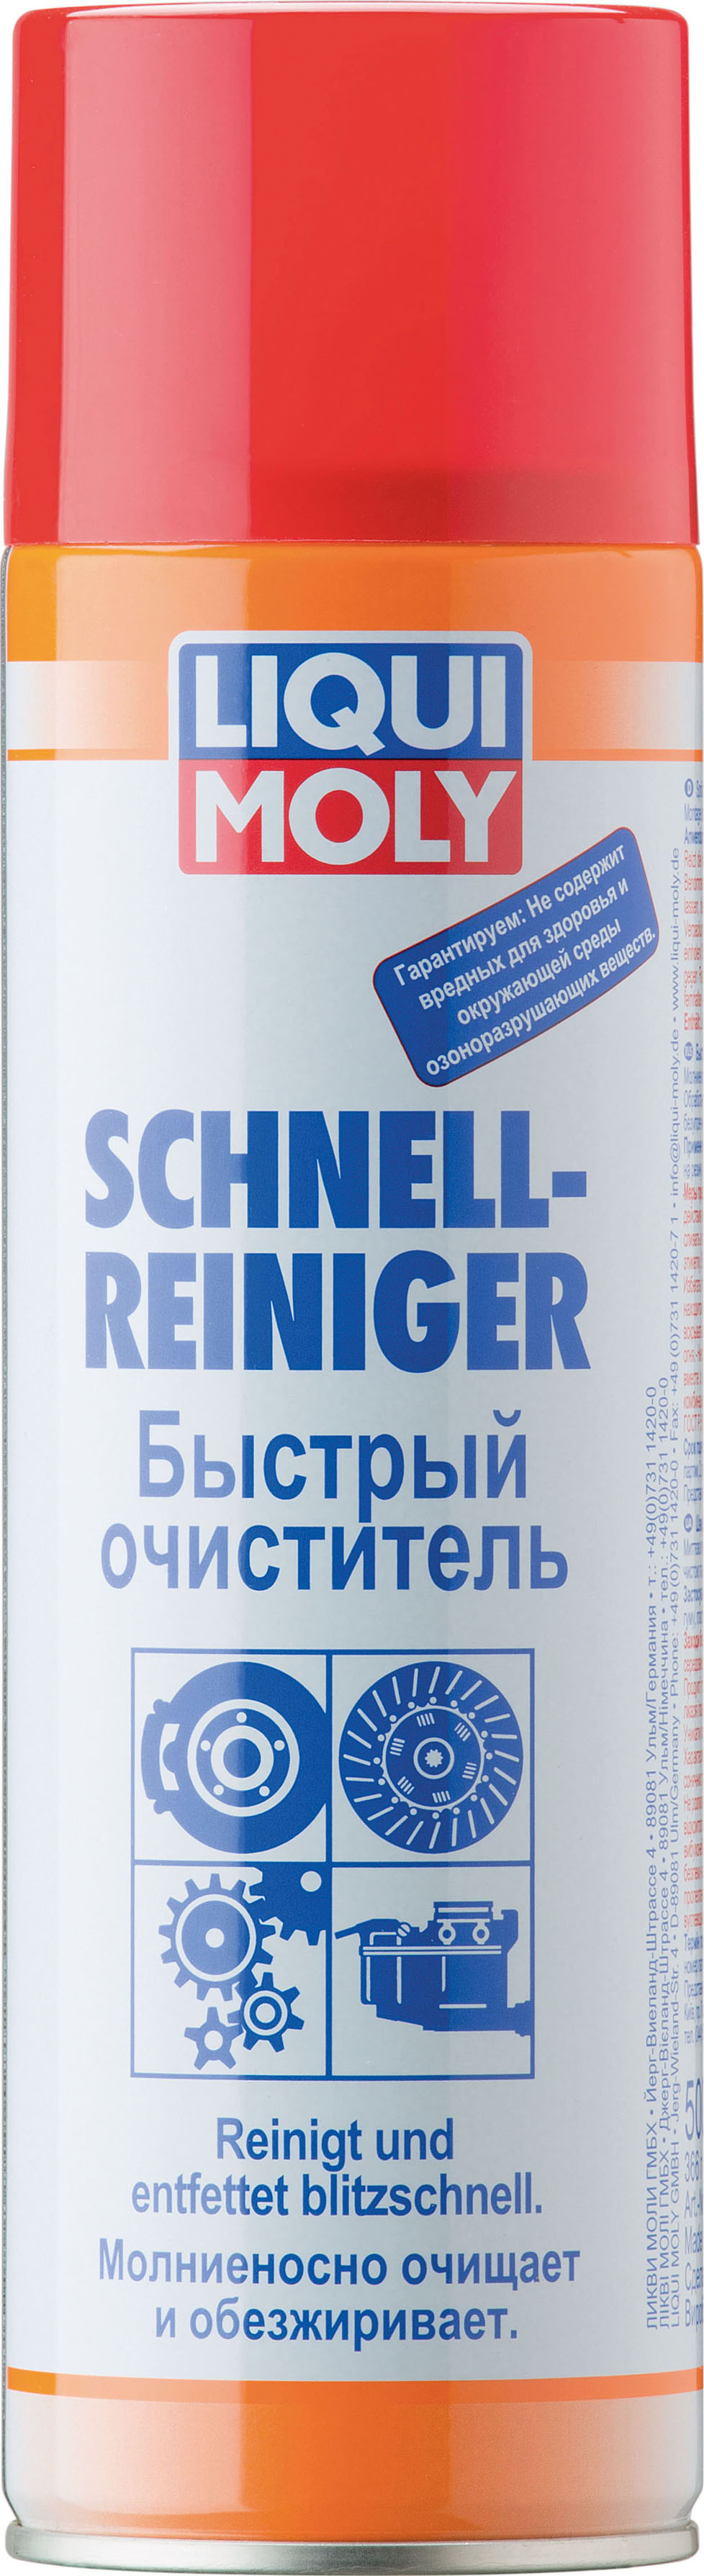 Быстрый очиститель Schnell-Reiniger